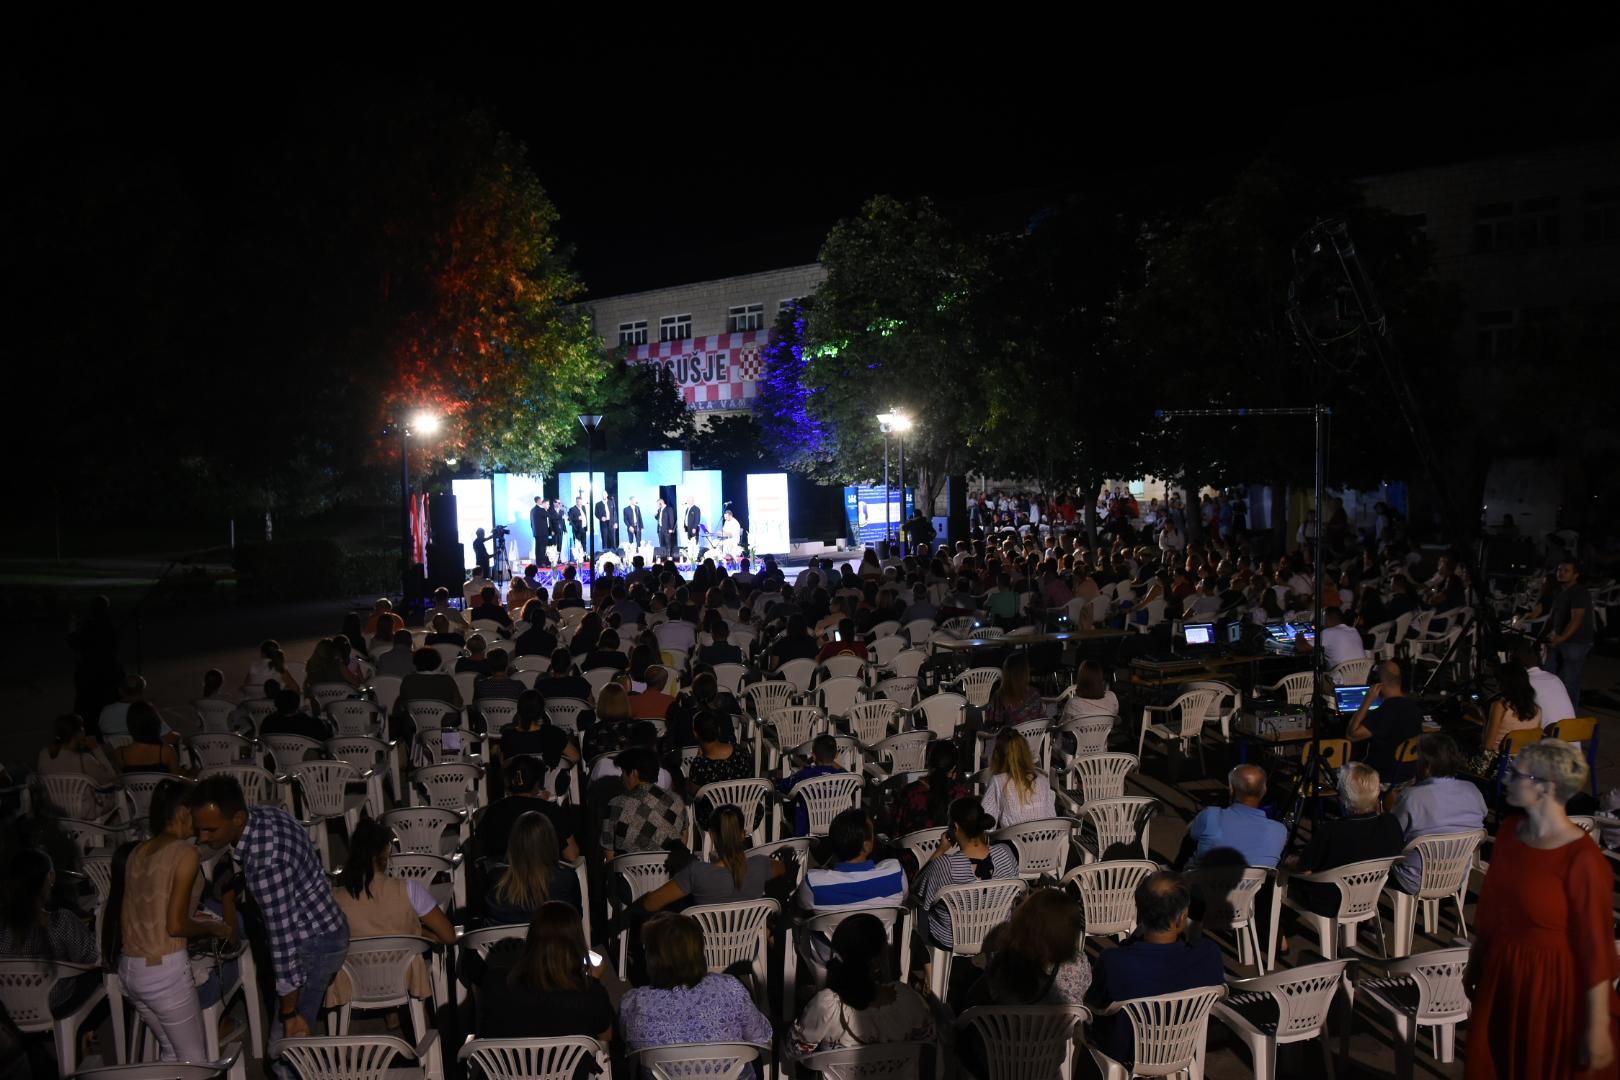 V. Festival klapske pisme u Posušju završen pobjedom Teranki